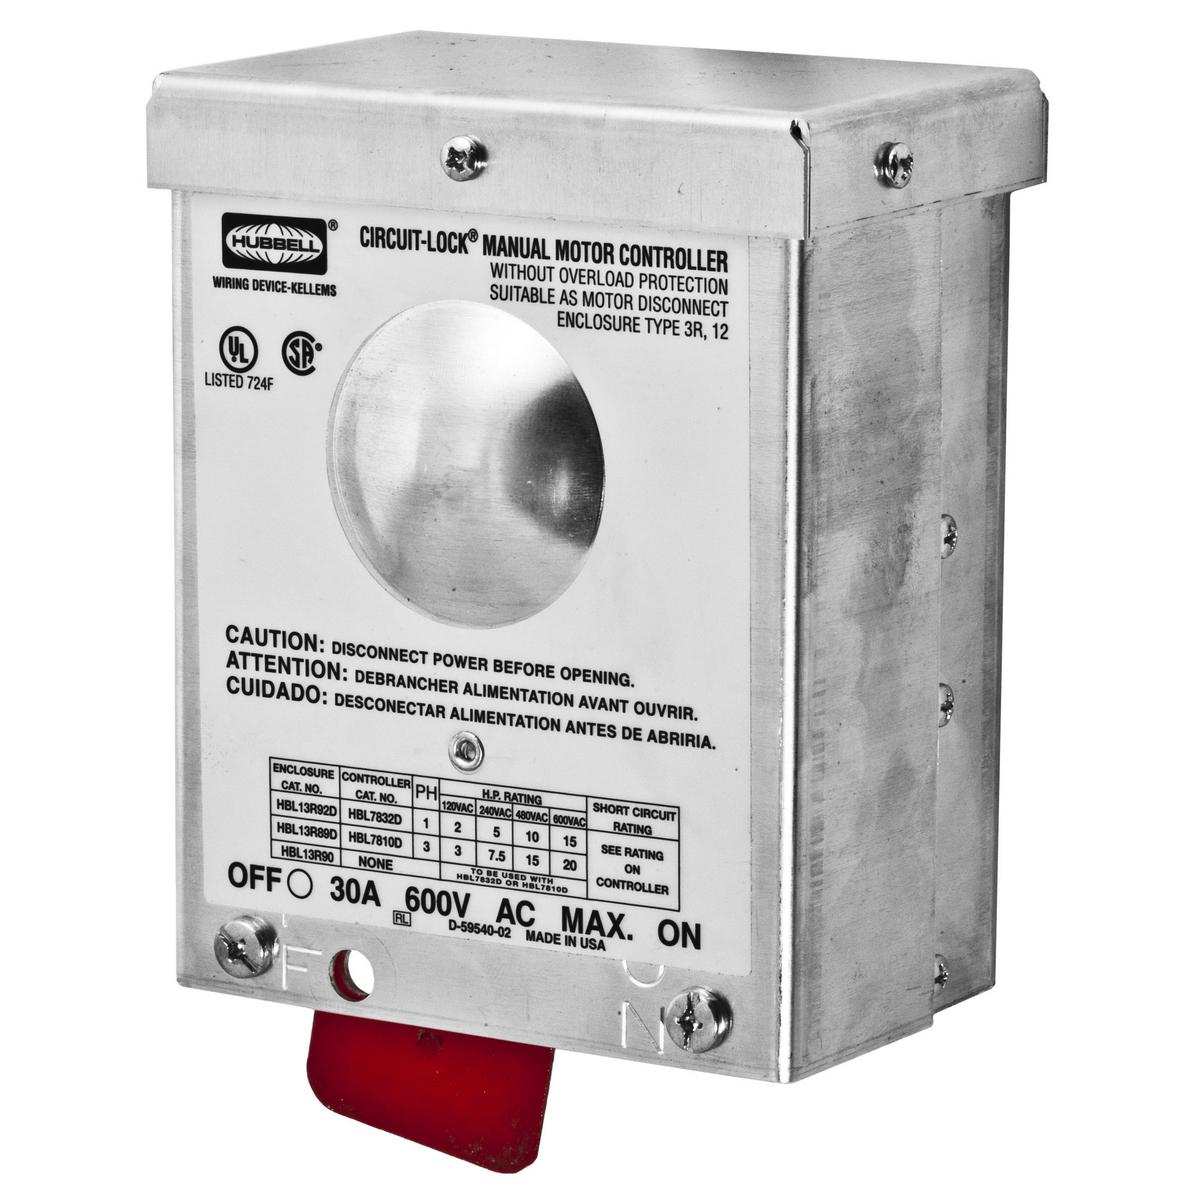 Hbl13r89d Brand Wiring Device Kellems